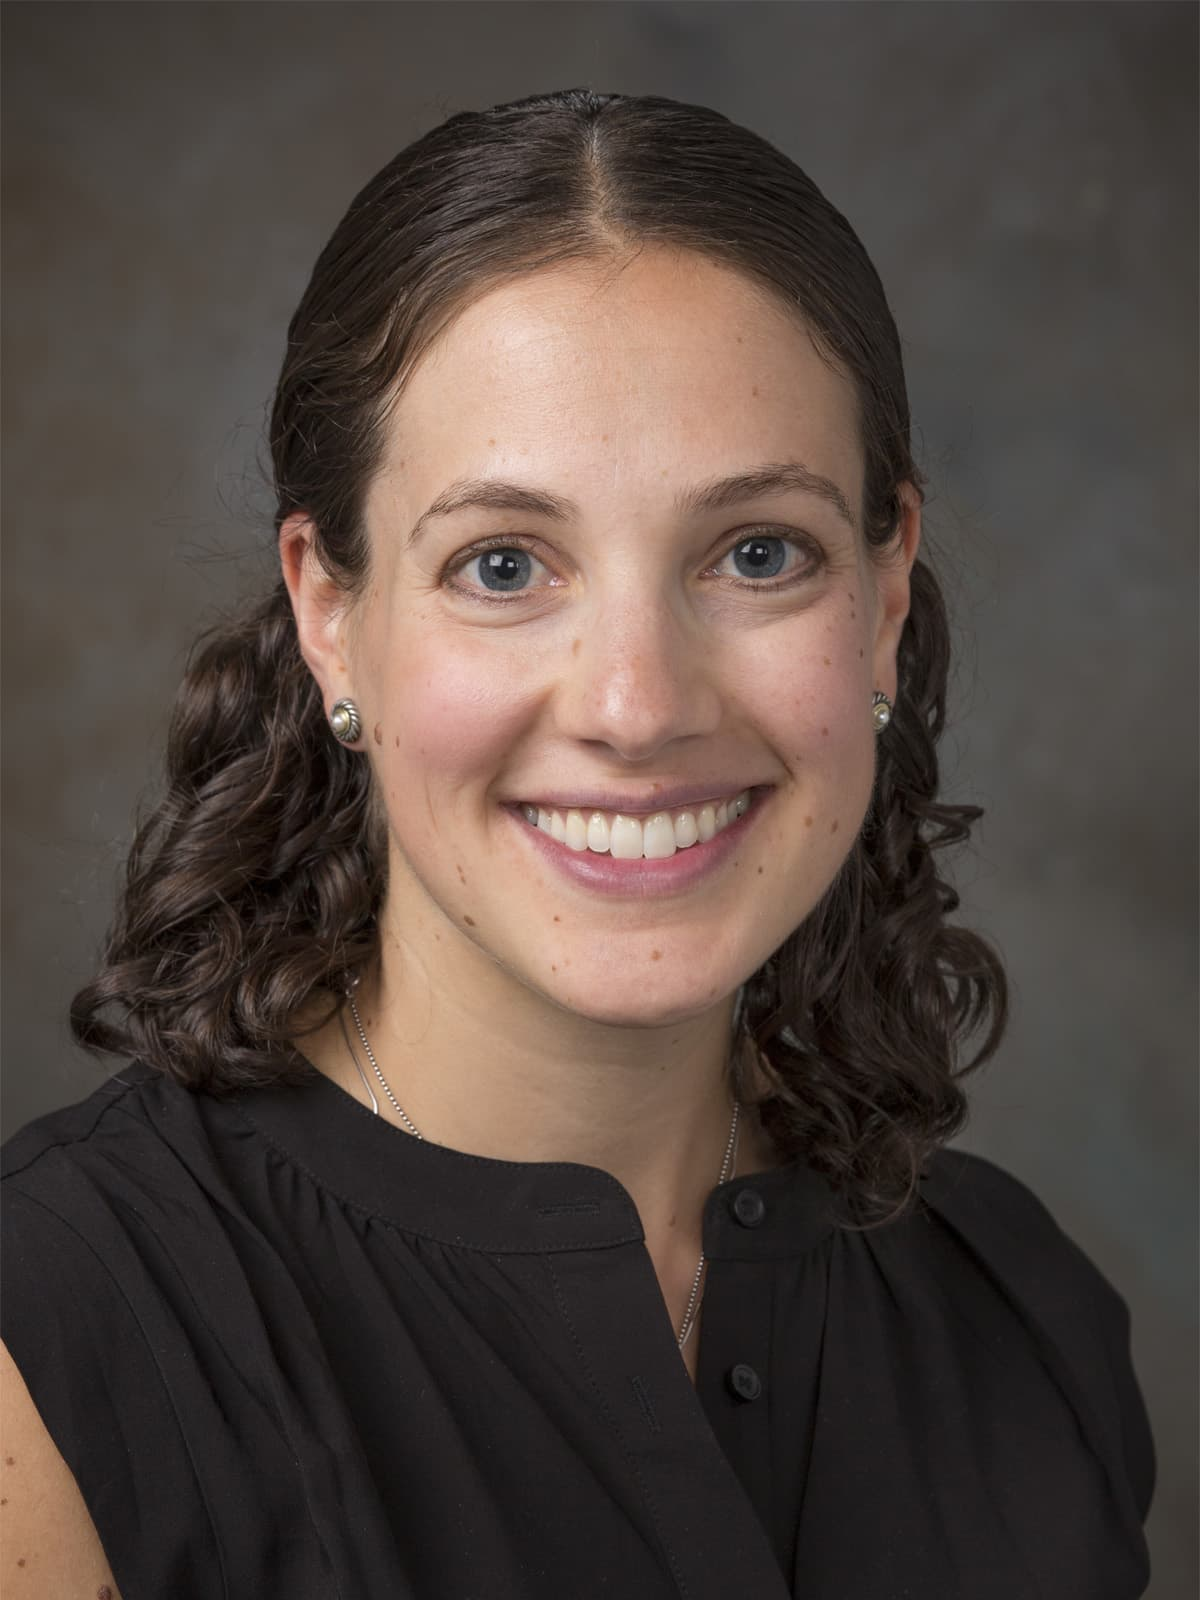 Danya Rosen